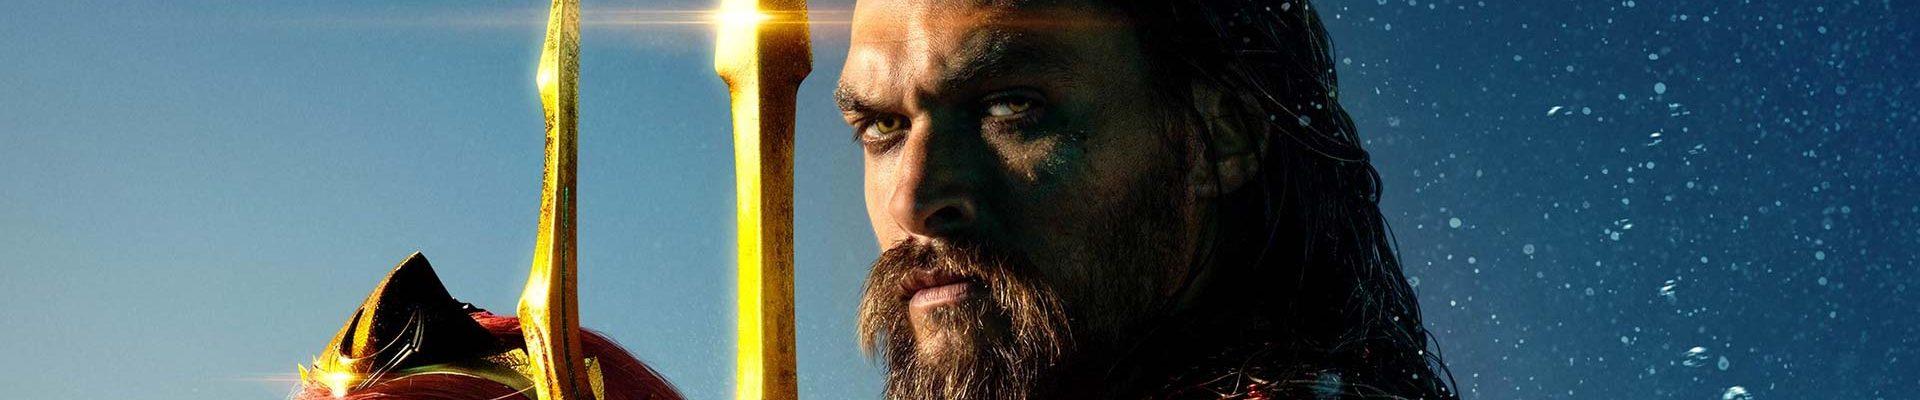 Aquaman Movie Tanweer Press Release